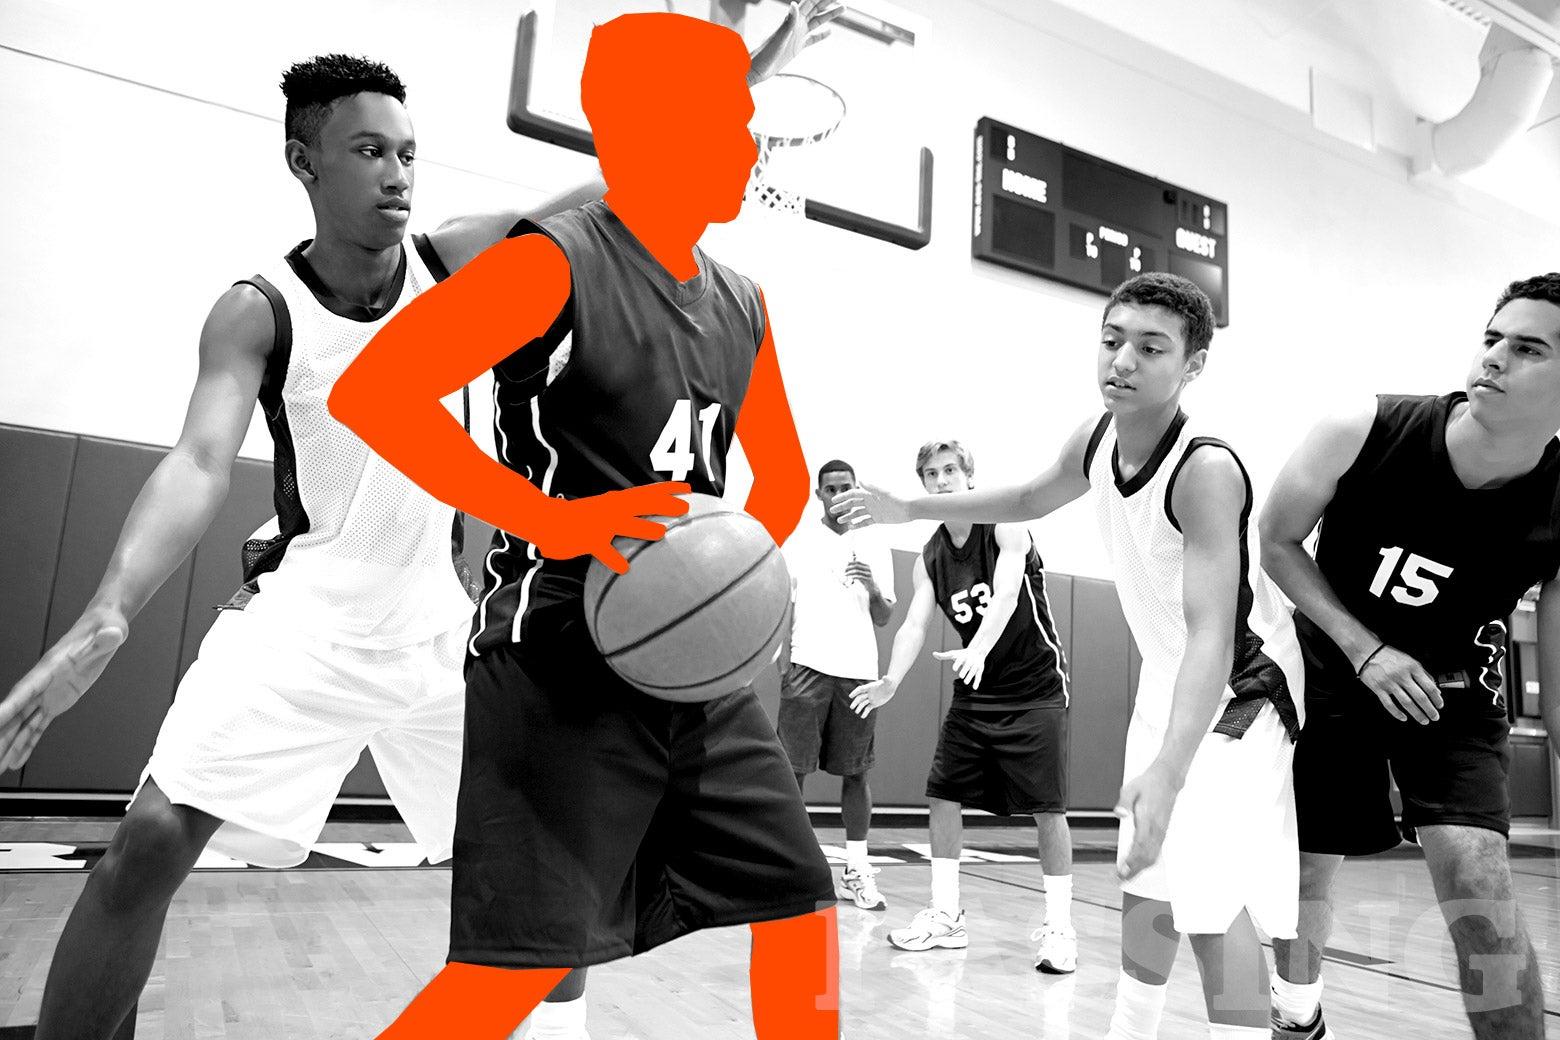 A high school basketball game.